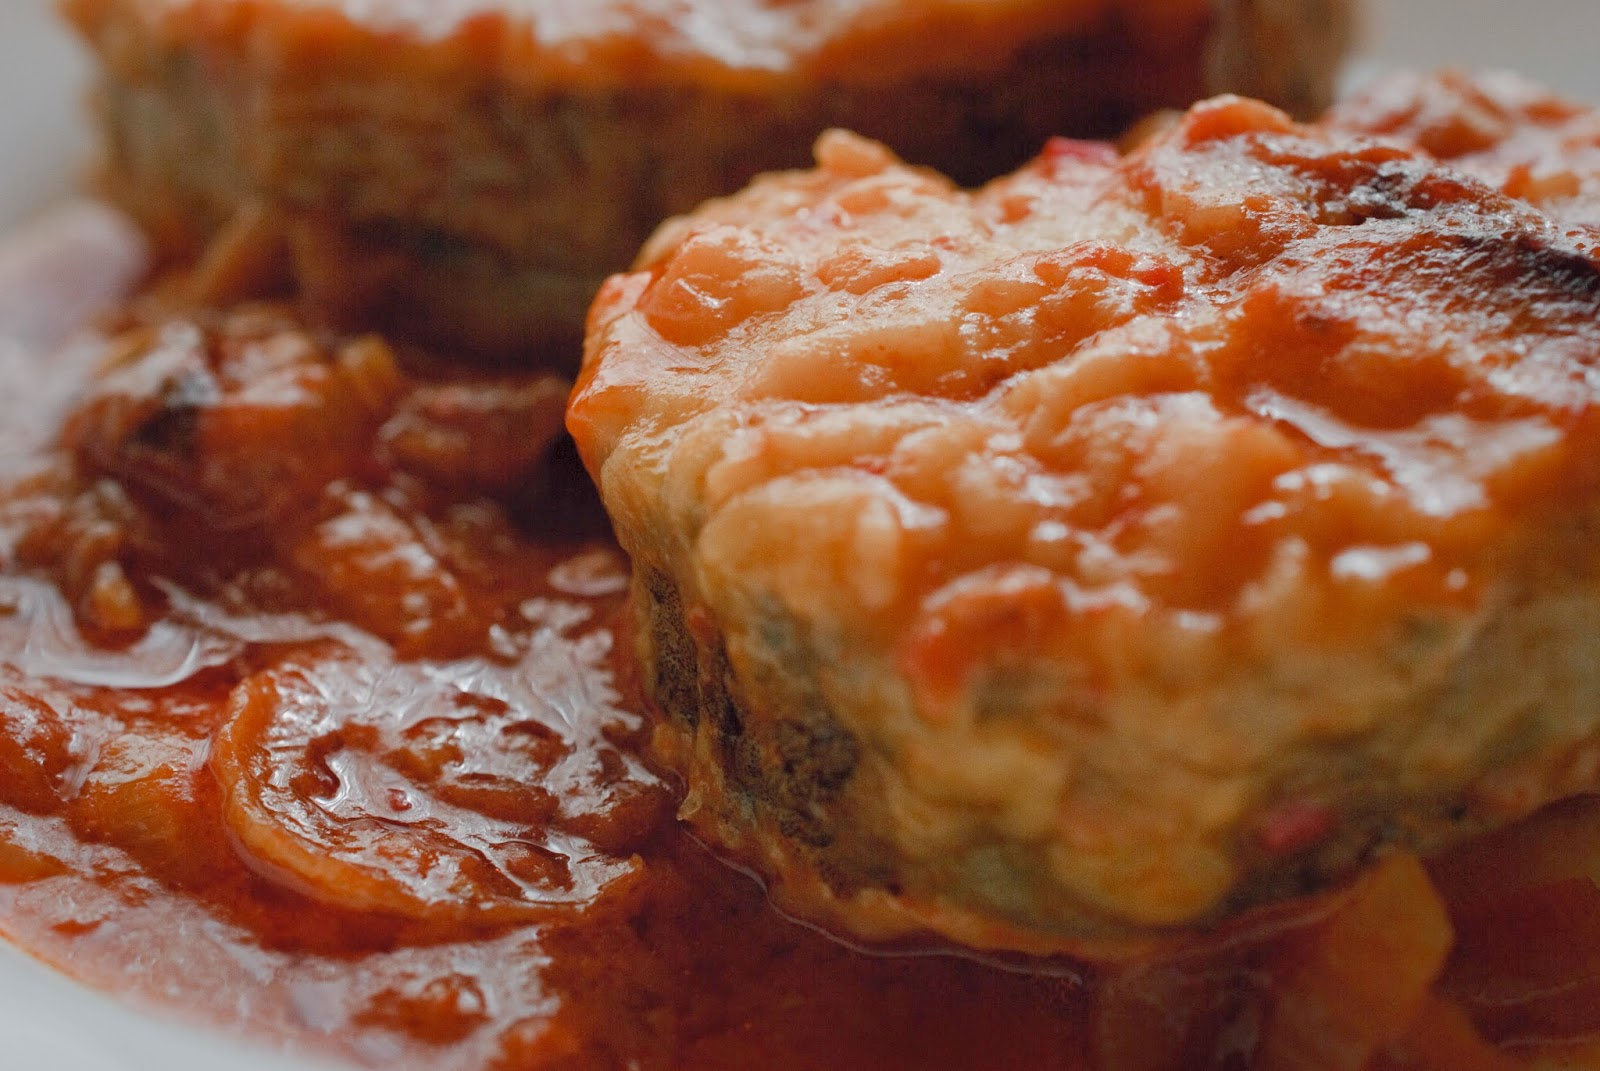 Merluza en salsa; Hake in sauce